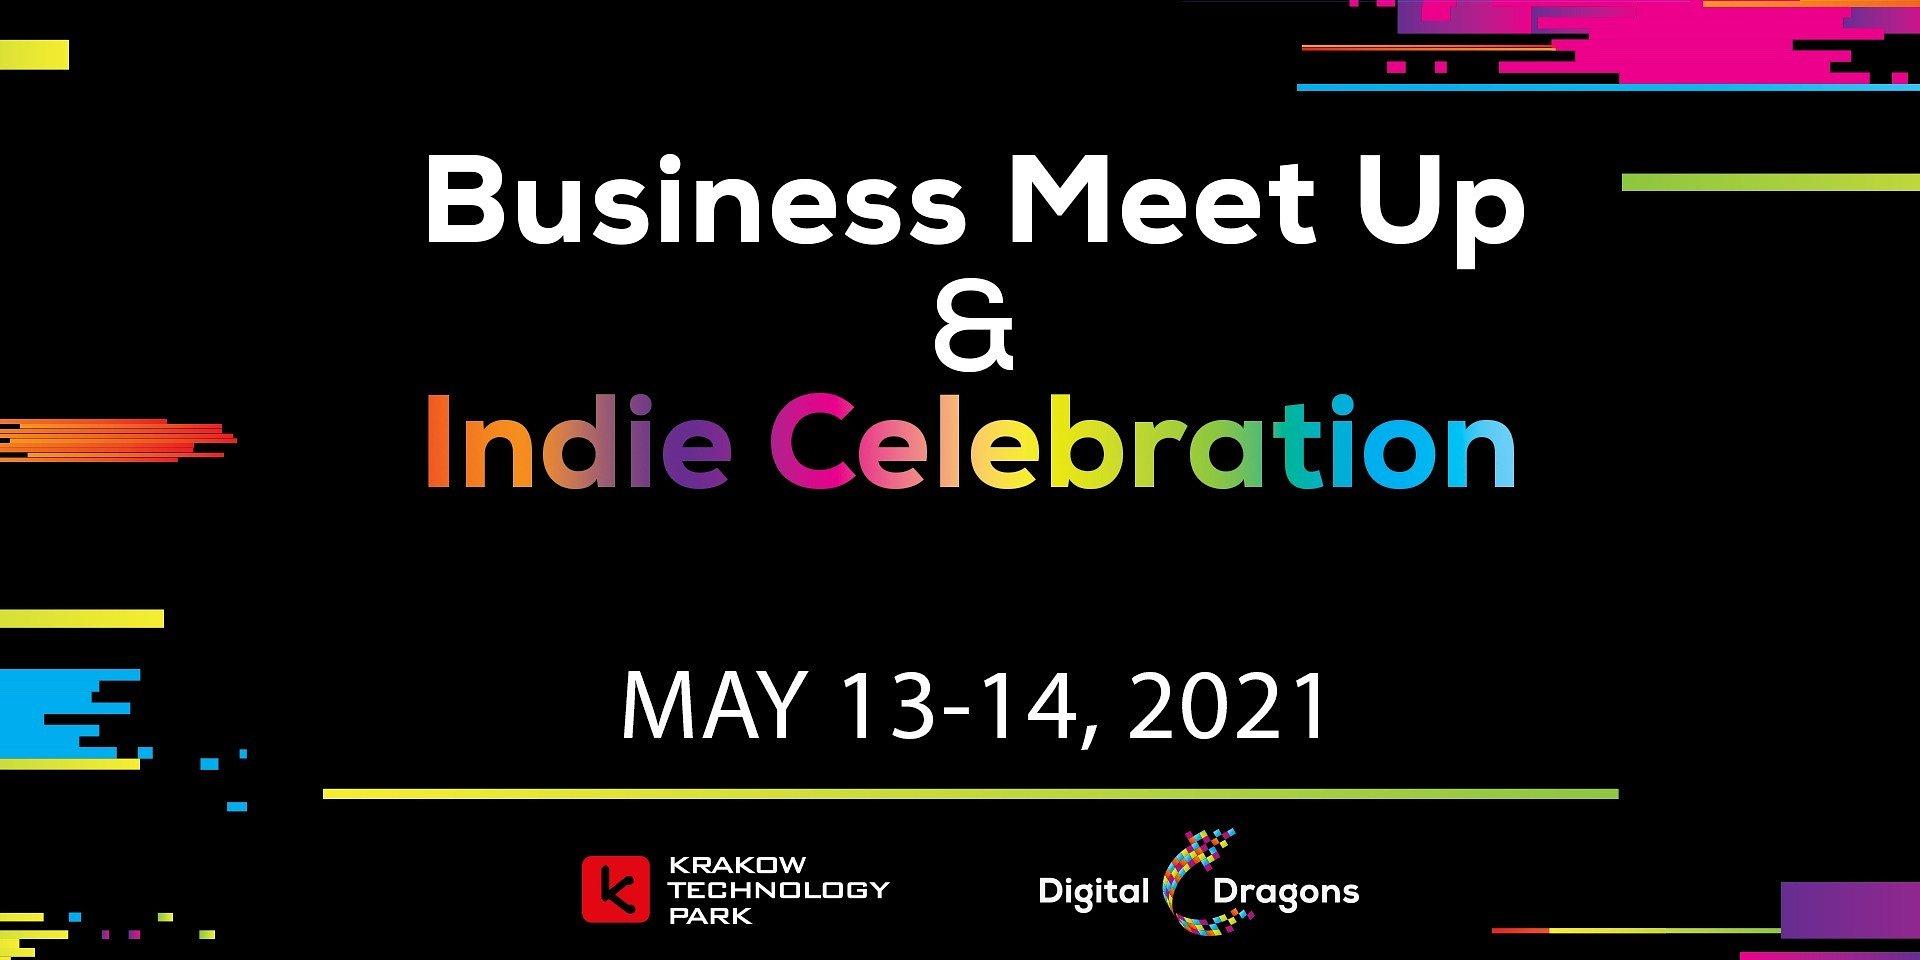 We know the winners of Digital Dragons Indie Celebration 2021!